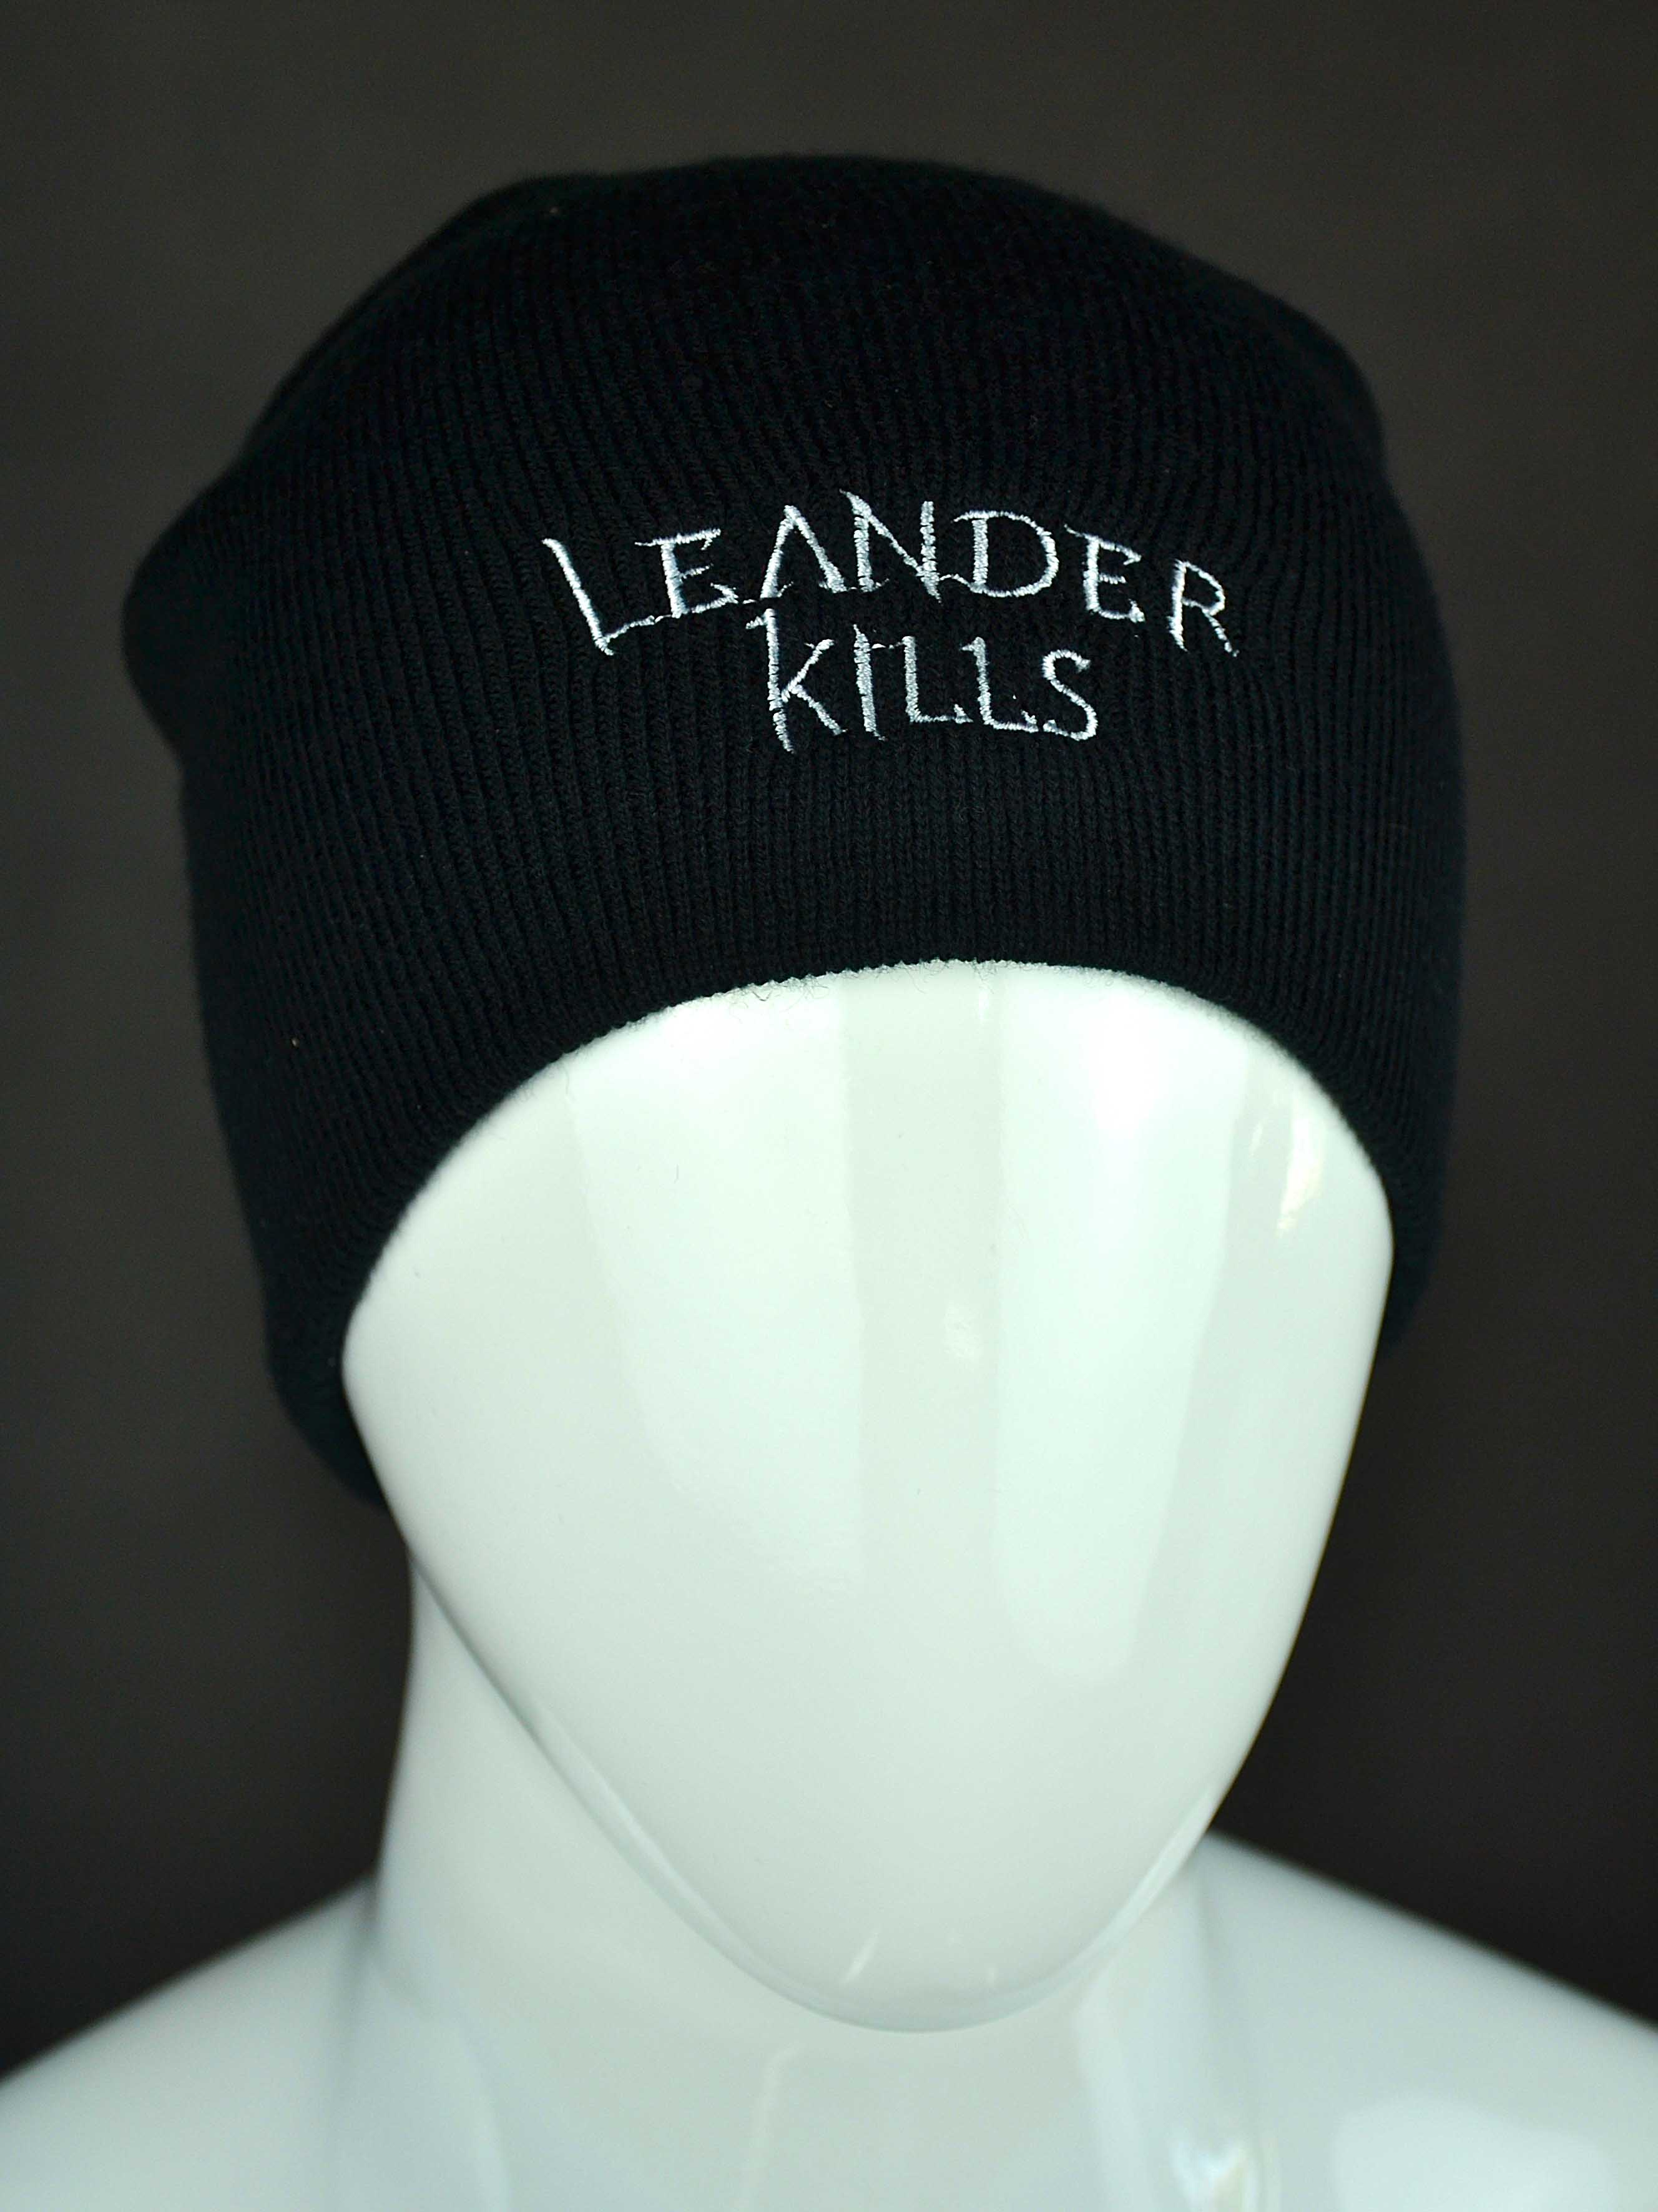 Leander Kills - téli sapka (fehér logó) ⋆ Leander Kills Webshop 04fb09100c